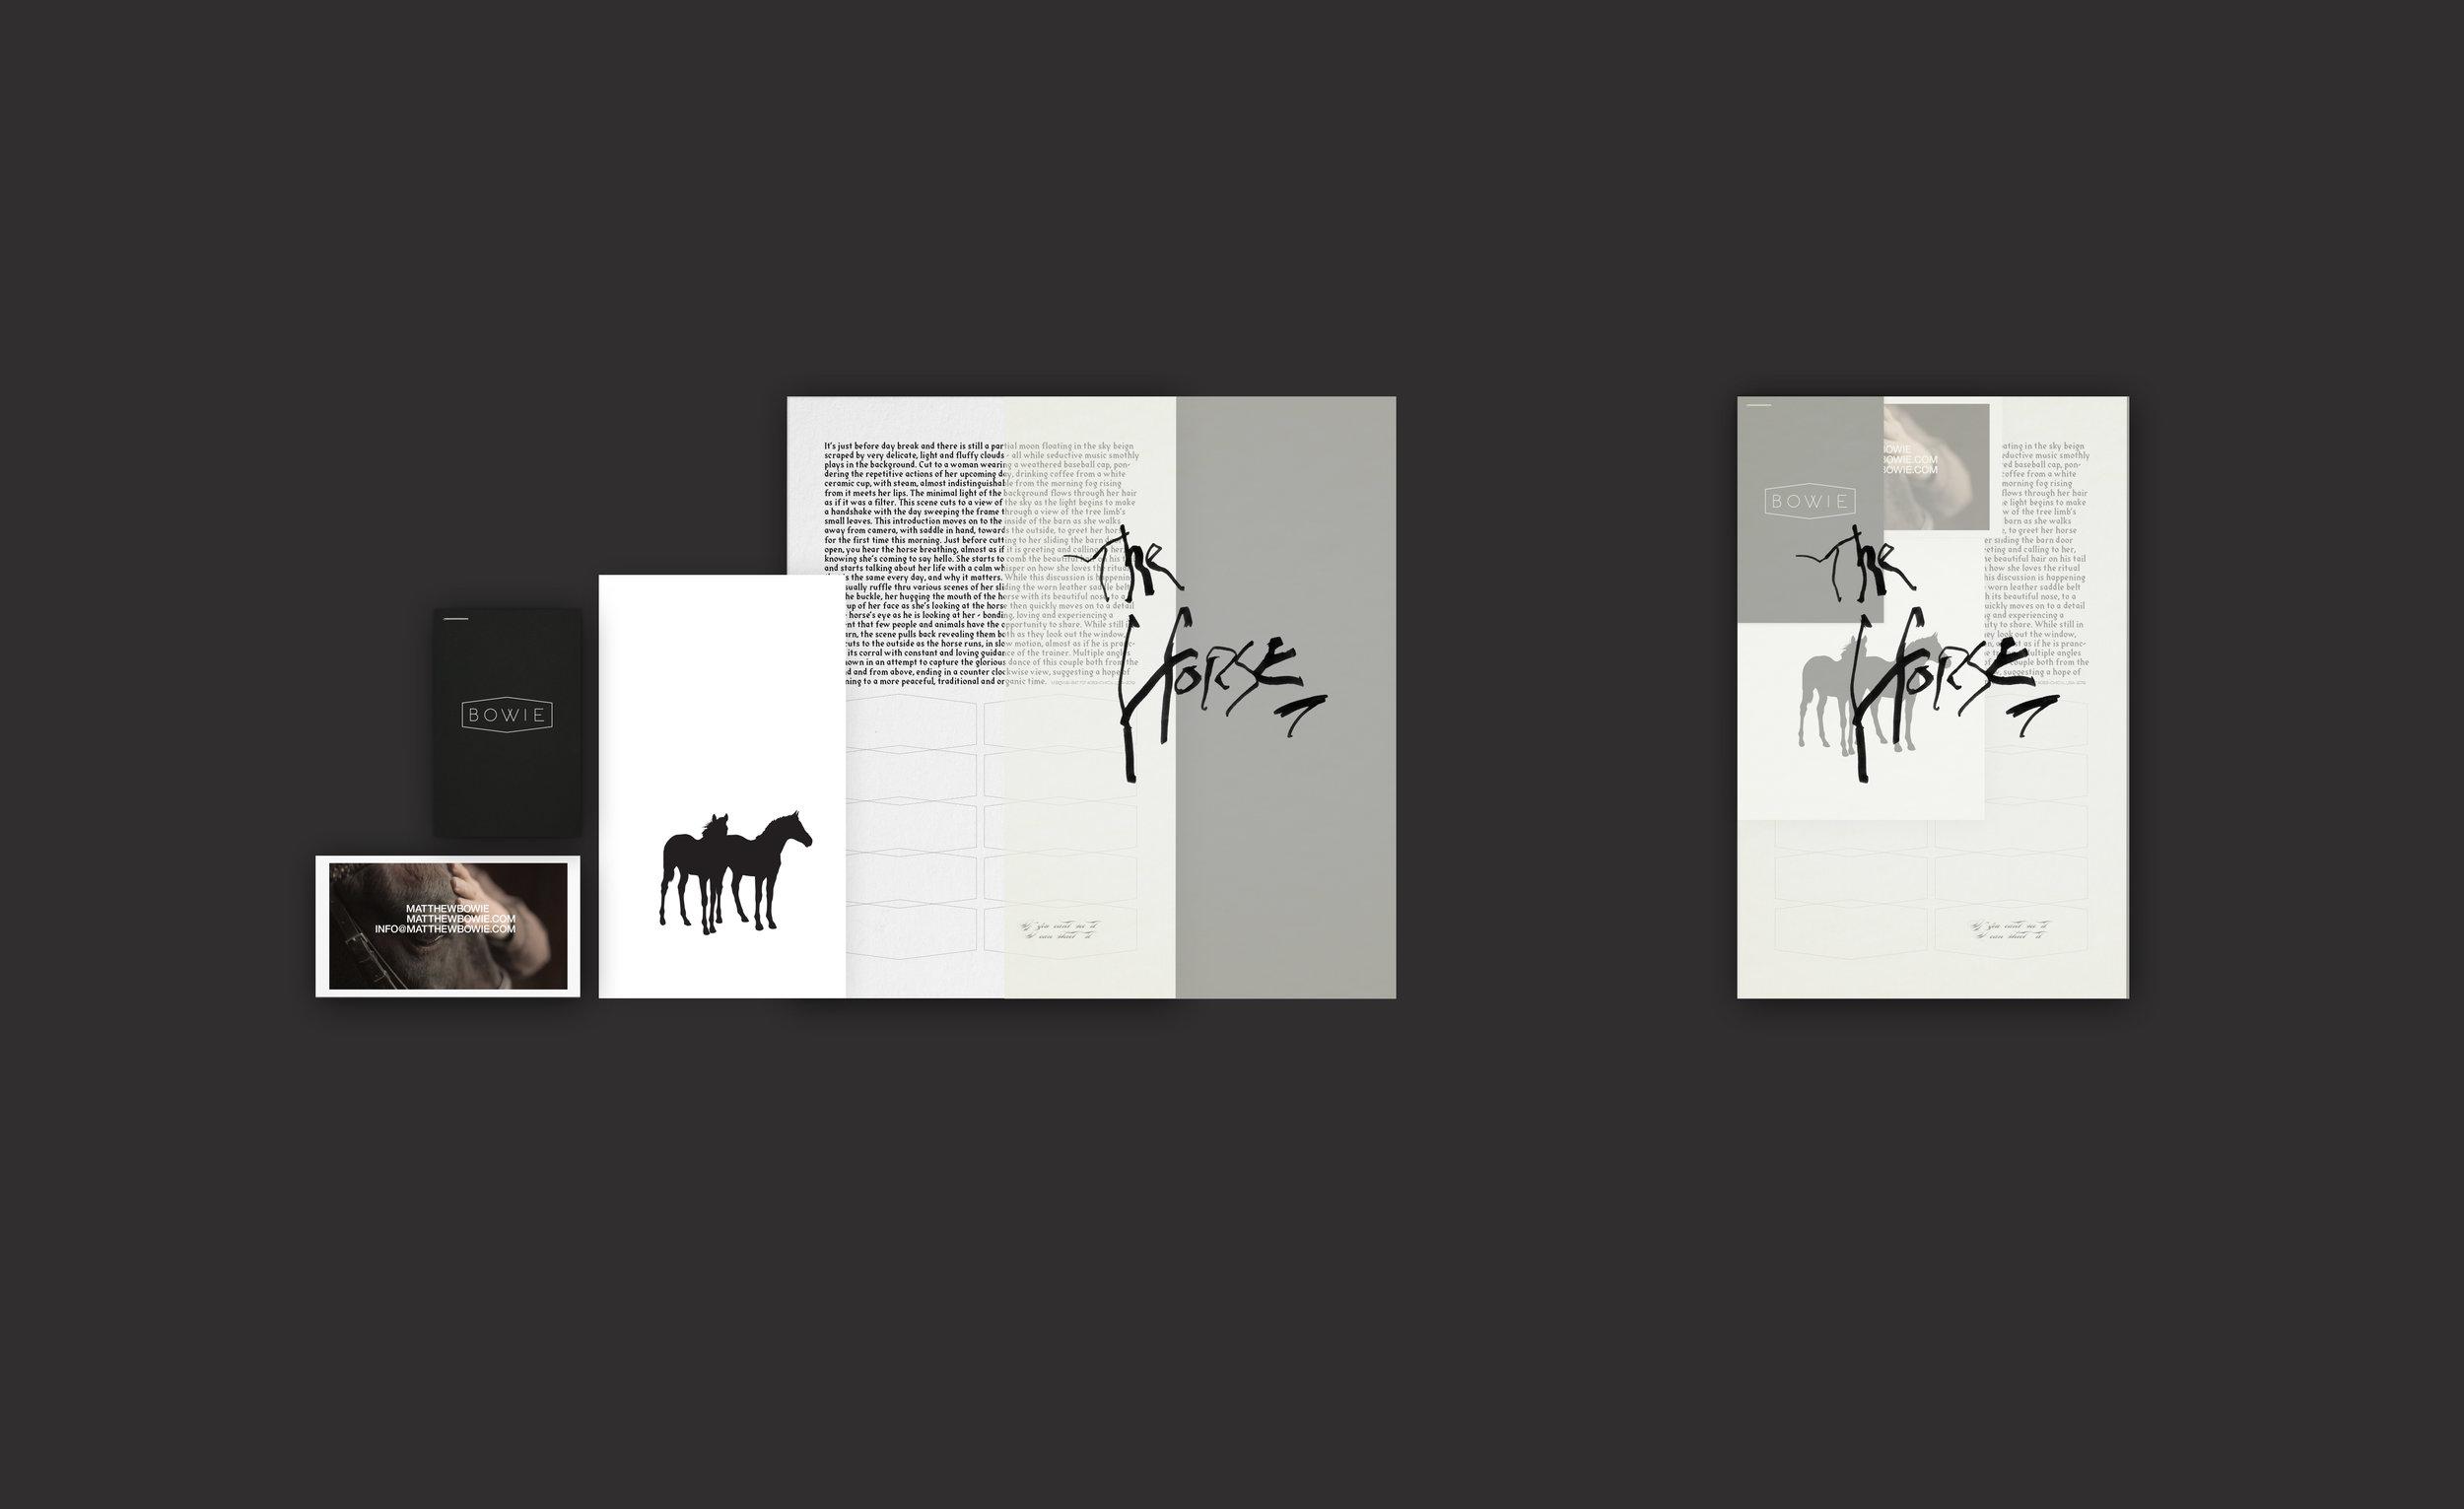 3D_the-horse_spread_5028w.jpg